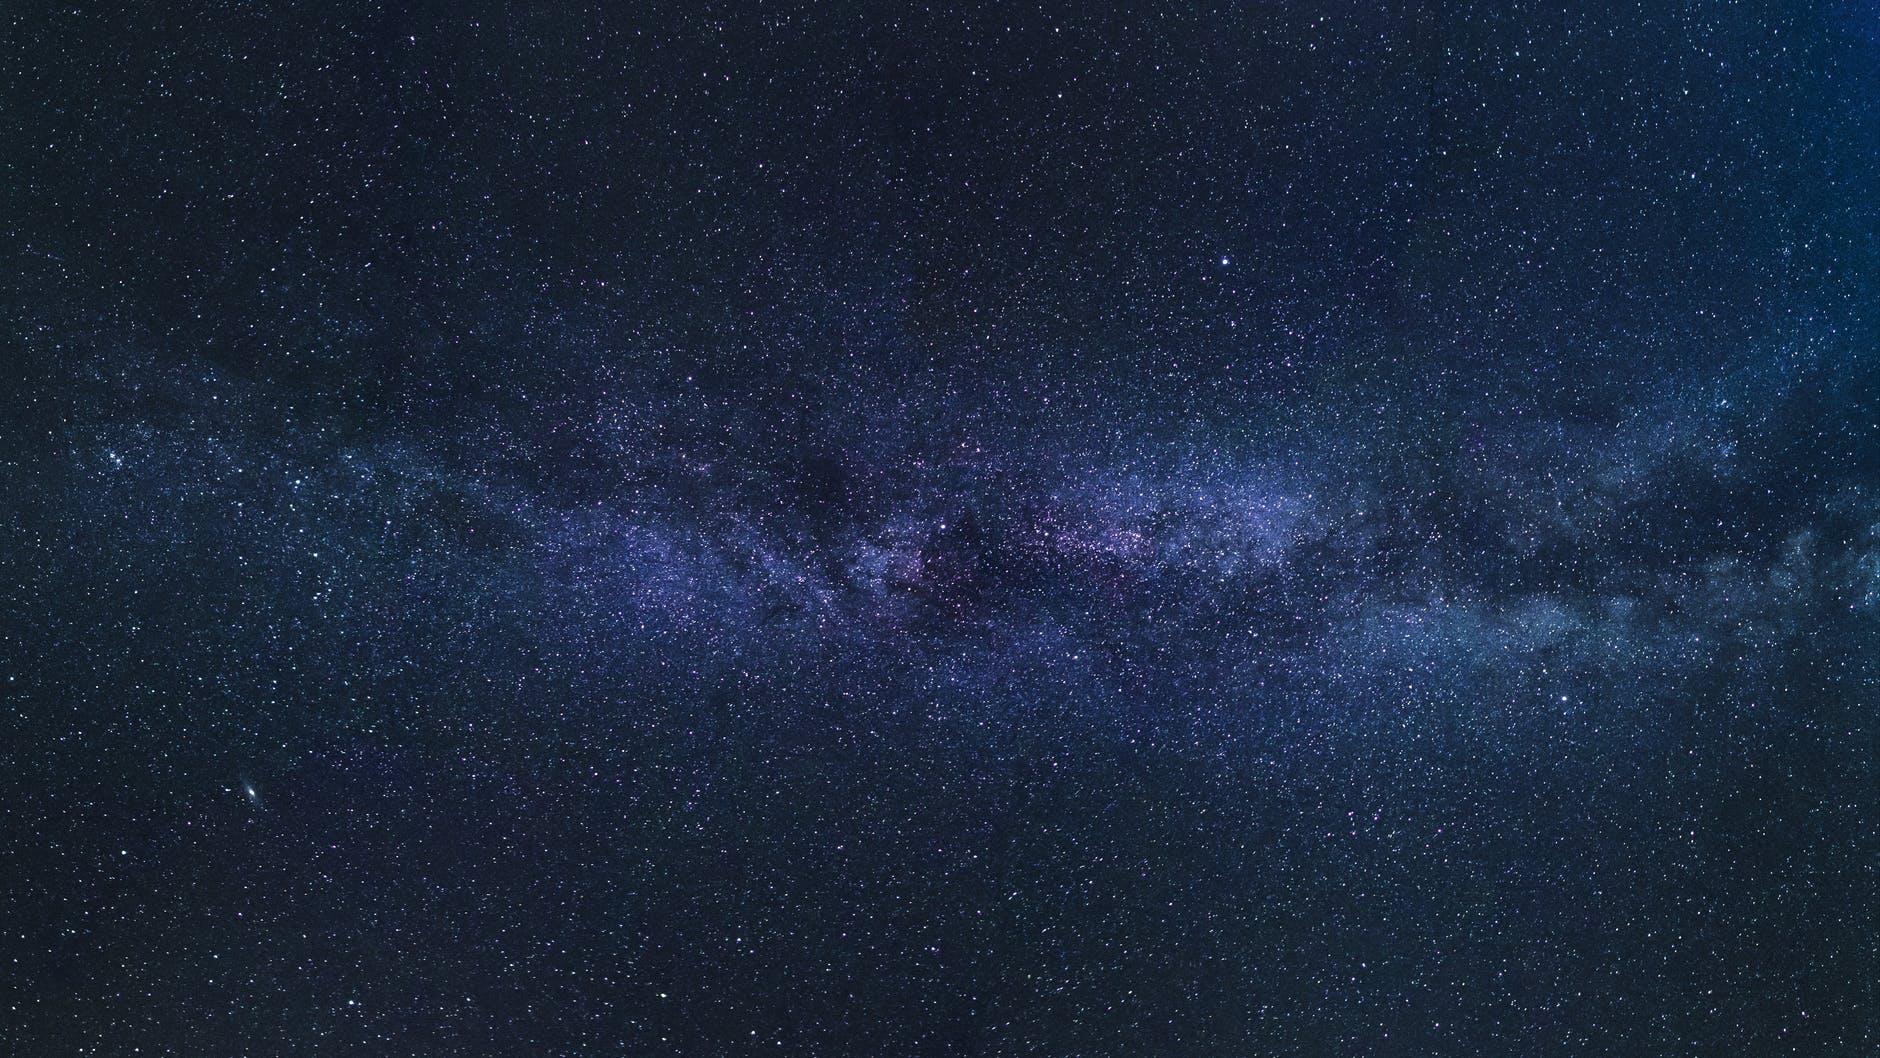 blue and purple cosmic sky